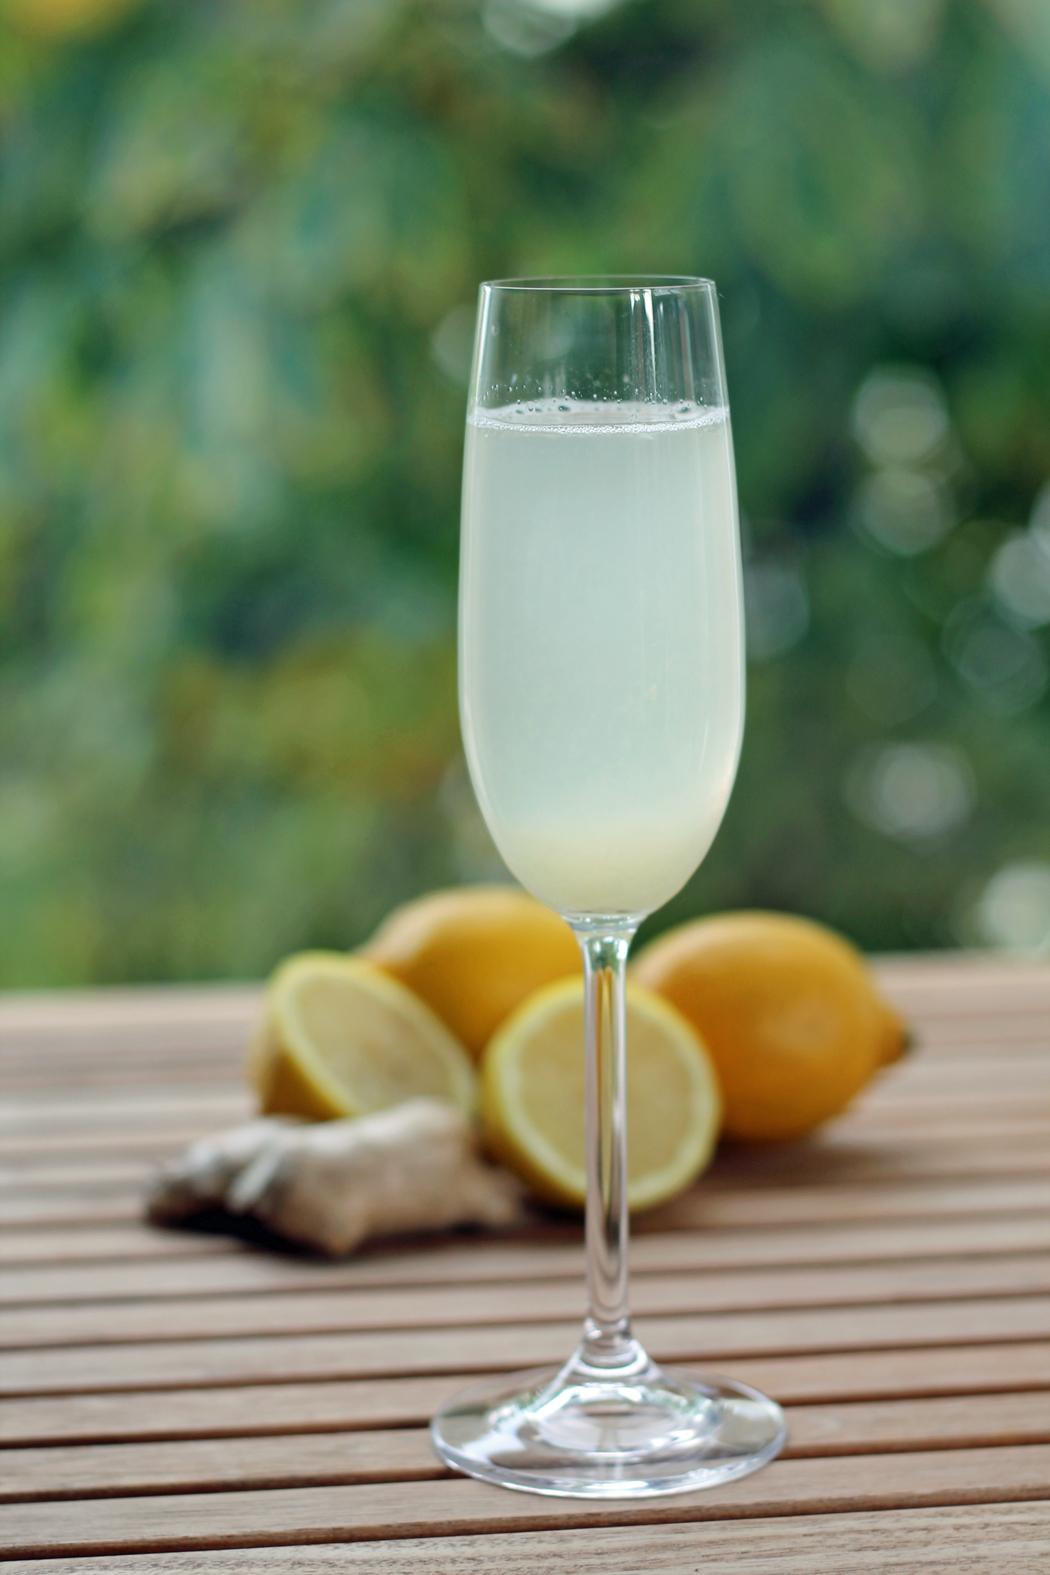 Frischer Ingwer-Zitronen-Tee